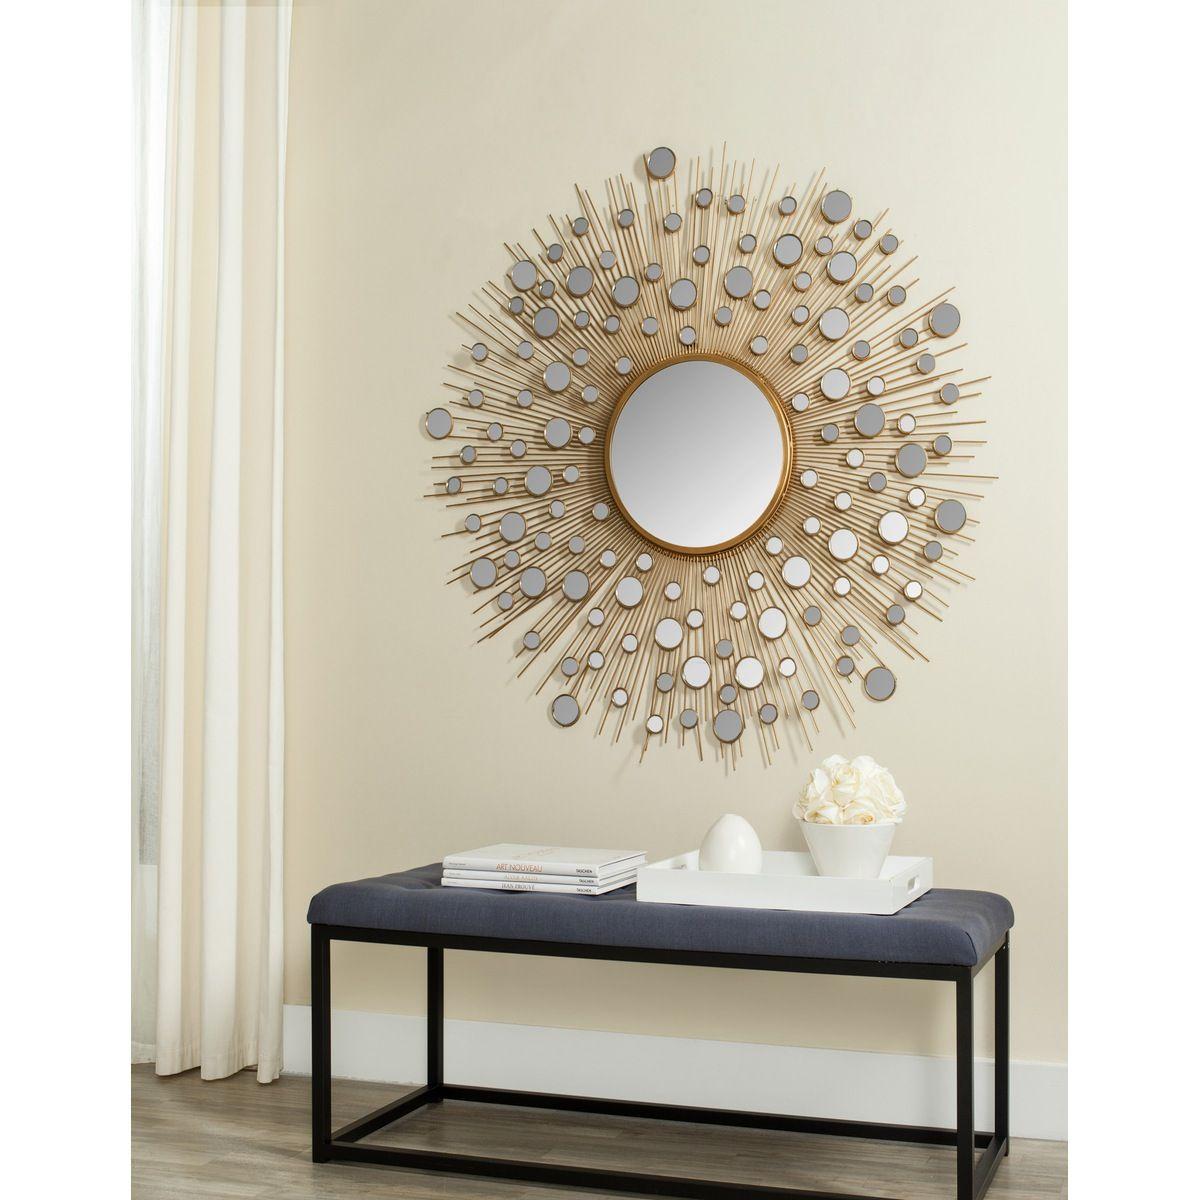 Safavieh Kiara Rain Drops Mirror  Rain Drops Decorative Mirrors Unique Decorative Mirrors Dining Room Decorating Inspiration